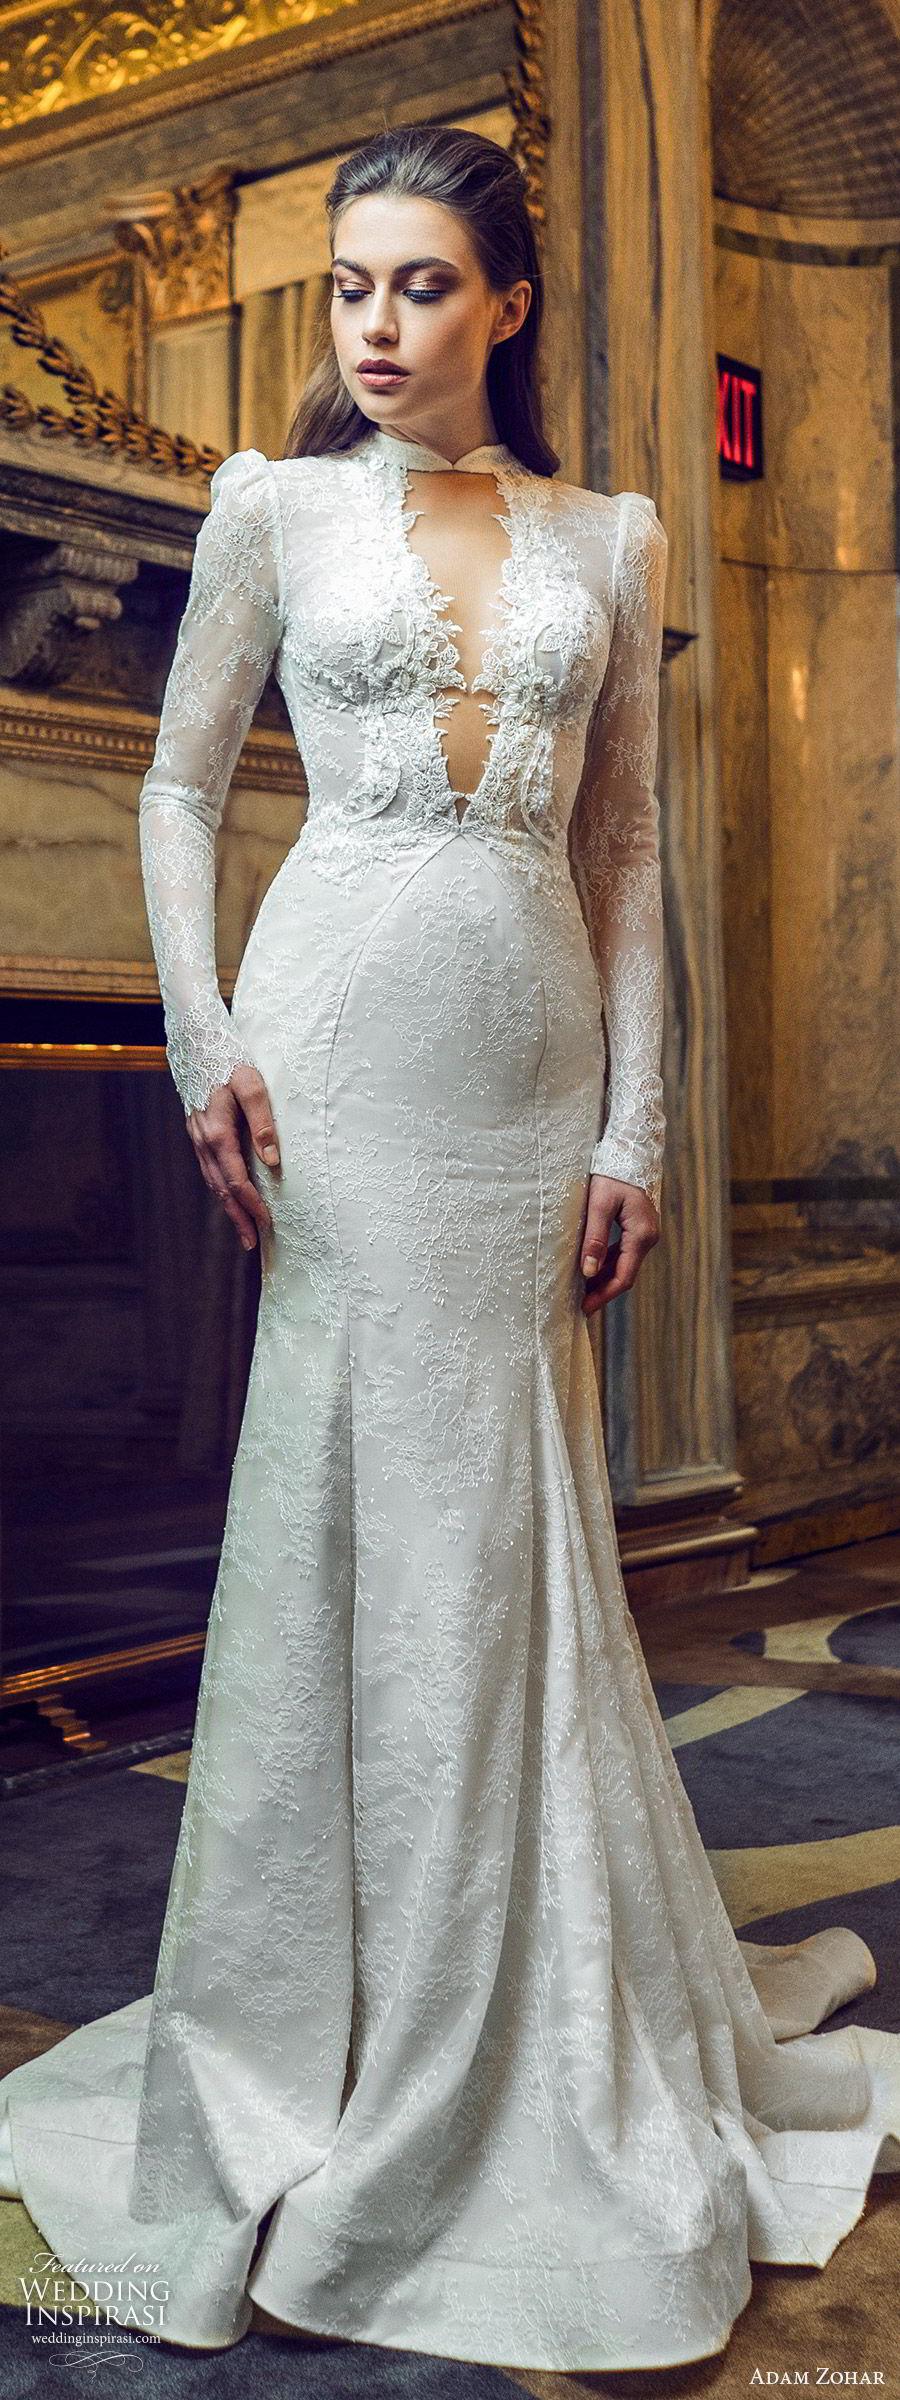 adam zohar 2020 bridal long puff sleeves high neck cutout deep v neckline fully lace mermaid fit flare wedding dress (14) vintage romantic chapel train mv